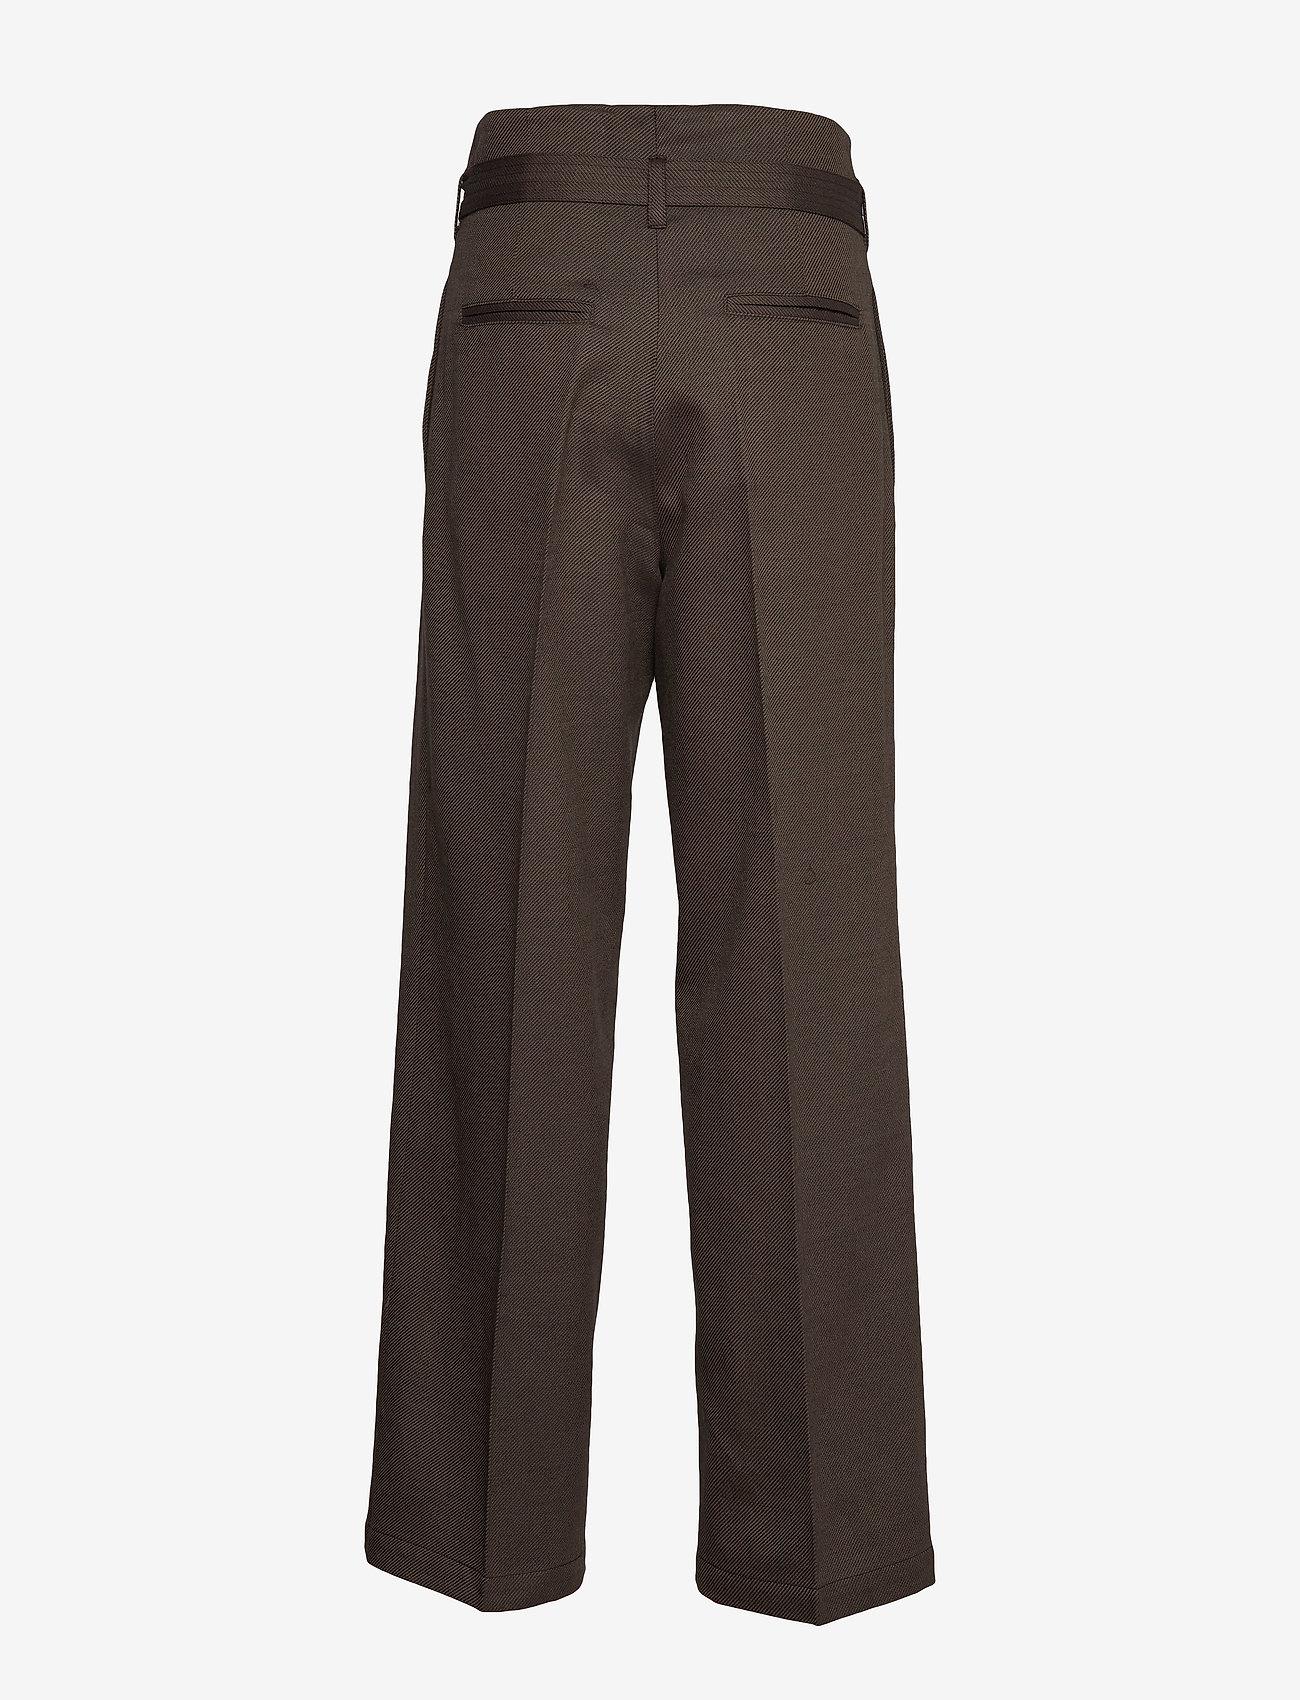 Lovechild 1979 Rosali Pant - Trousers